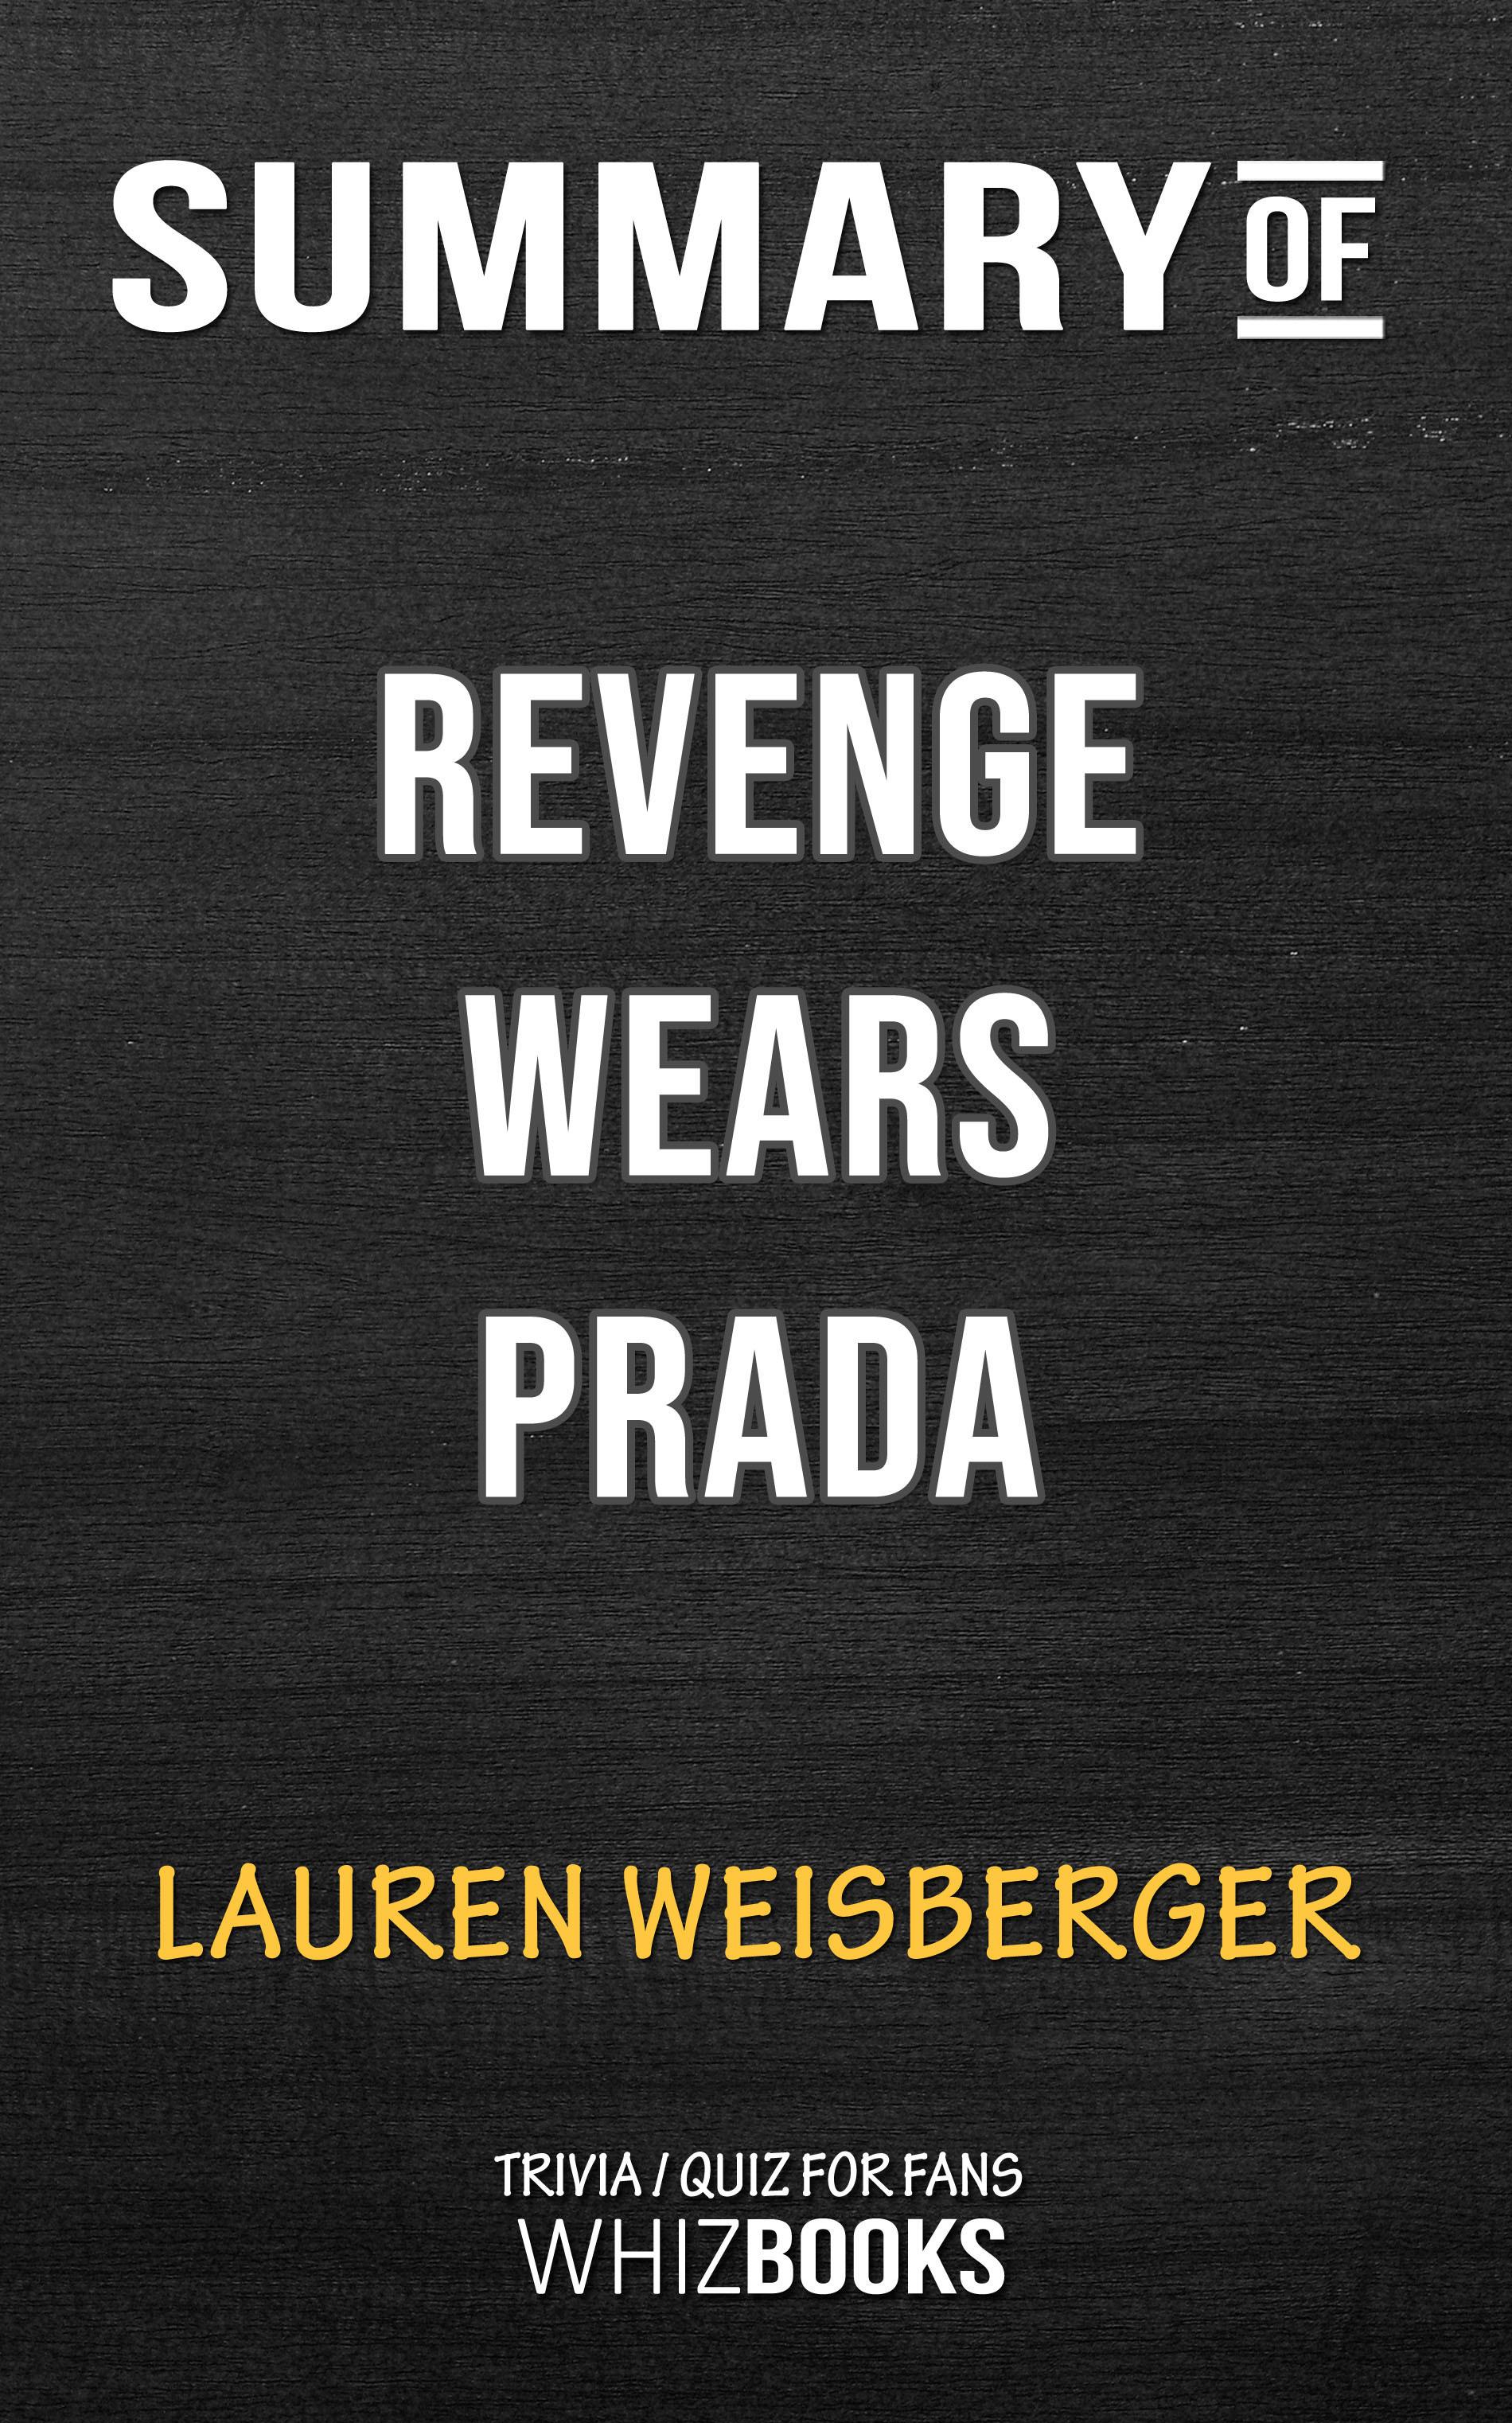 Summary of Revenge Wears Prada: The Devil Returns by Lauren Weisberger